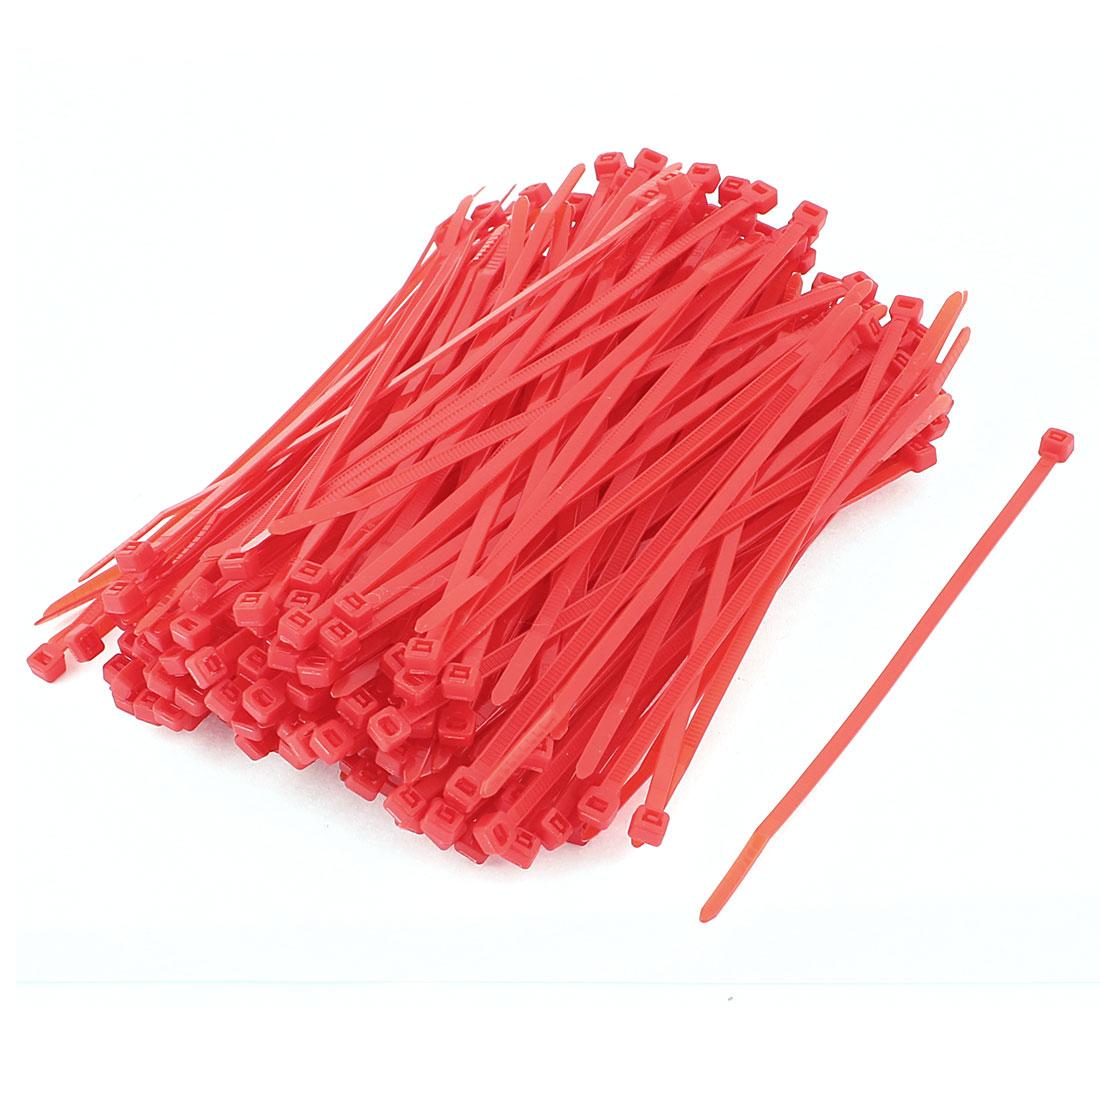 Nylon Self Locking Zip Trim Wrap Cable Wire Tie Red 3.6 x 150mm 250Pcs